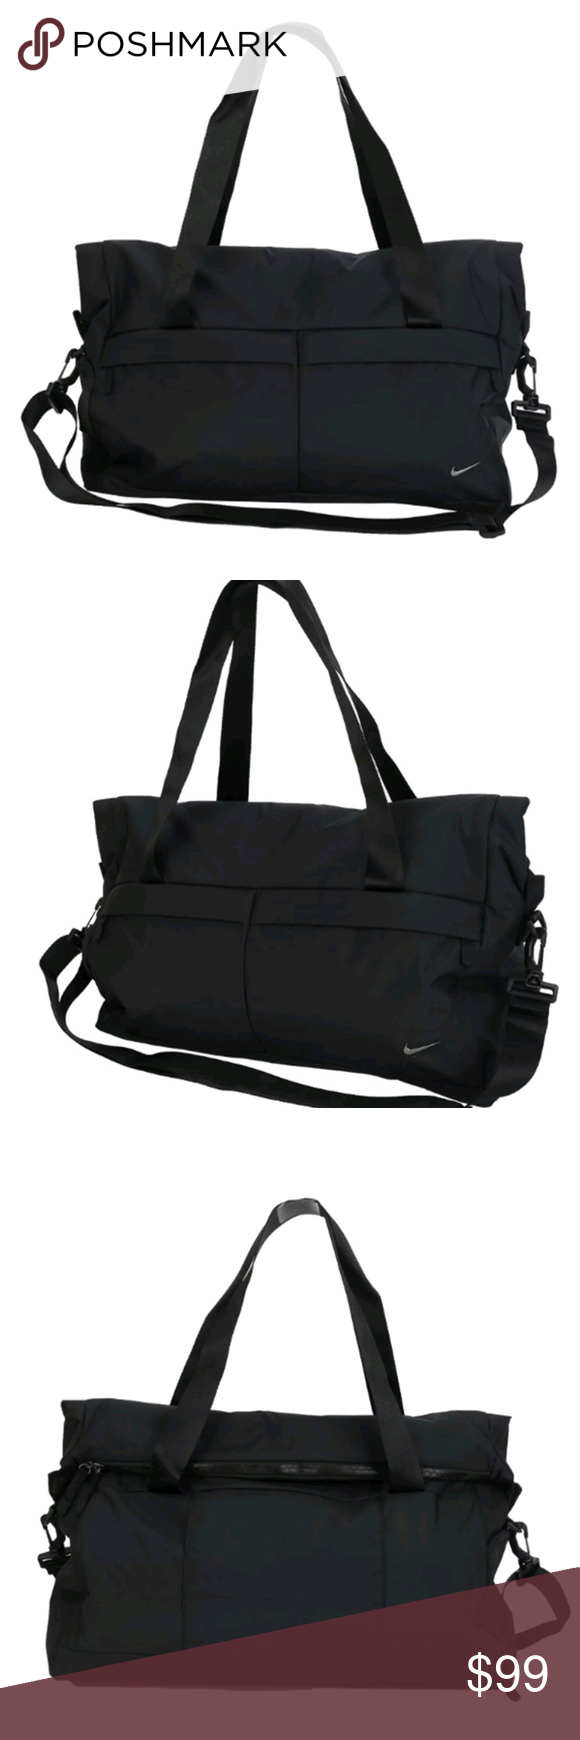 97f1ae06b2395 Gym Bag · Nike Legendary Club Duffel Bag Black NEW Nike Legend Club Bags  Black Running Sports Duffel Bag